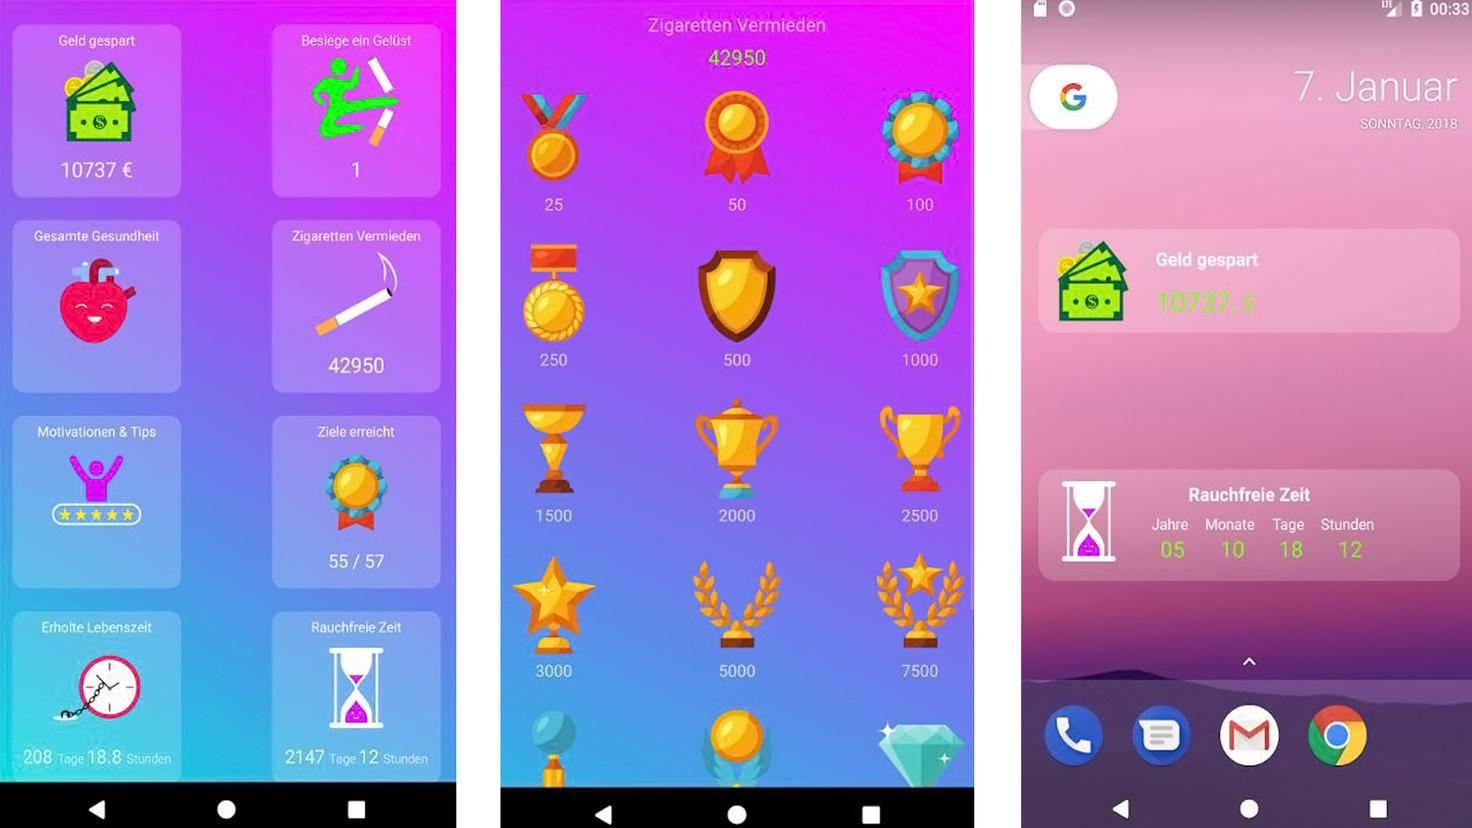 EasyQuit-Google Play Store-Mario Hanna